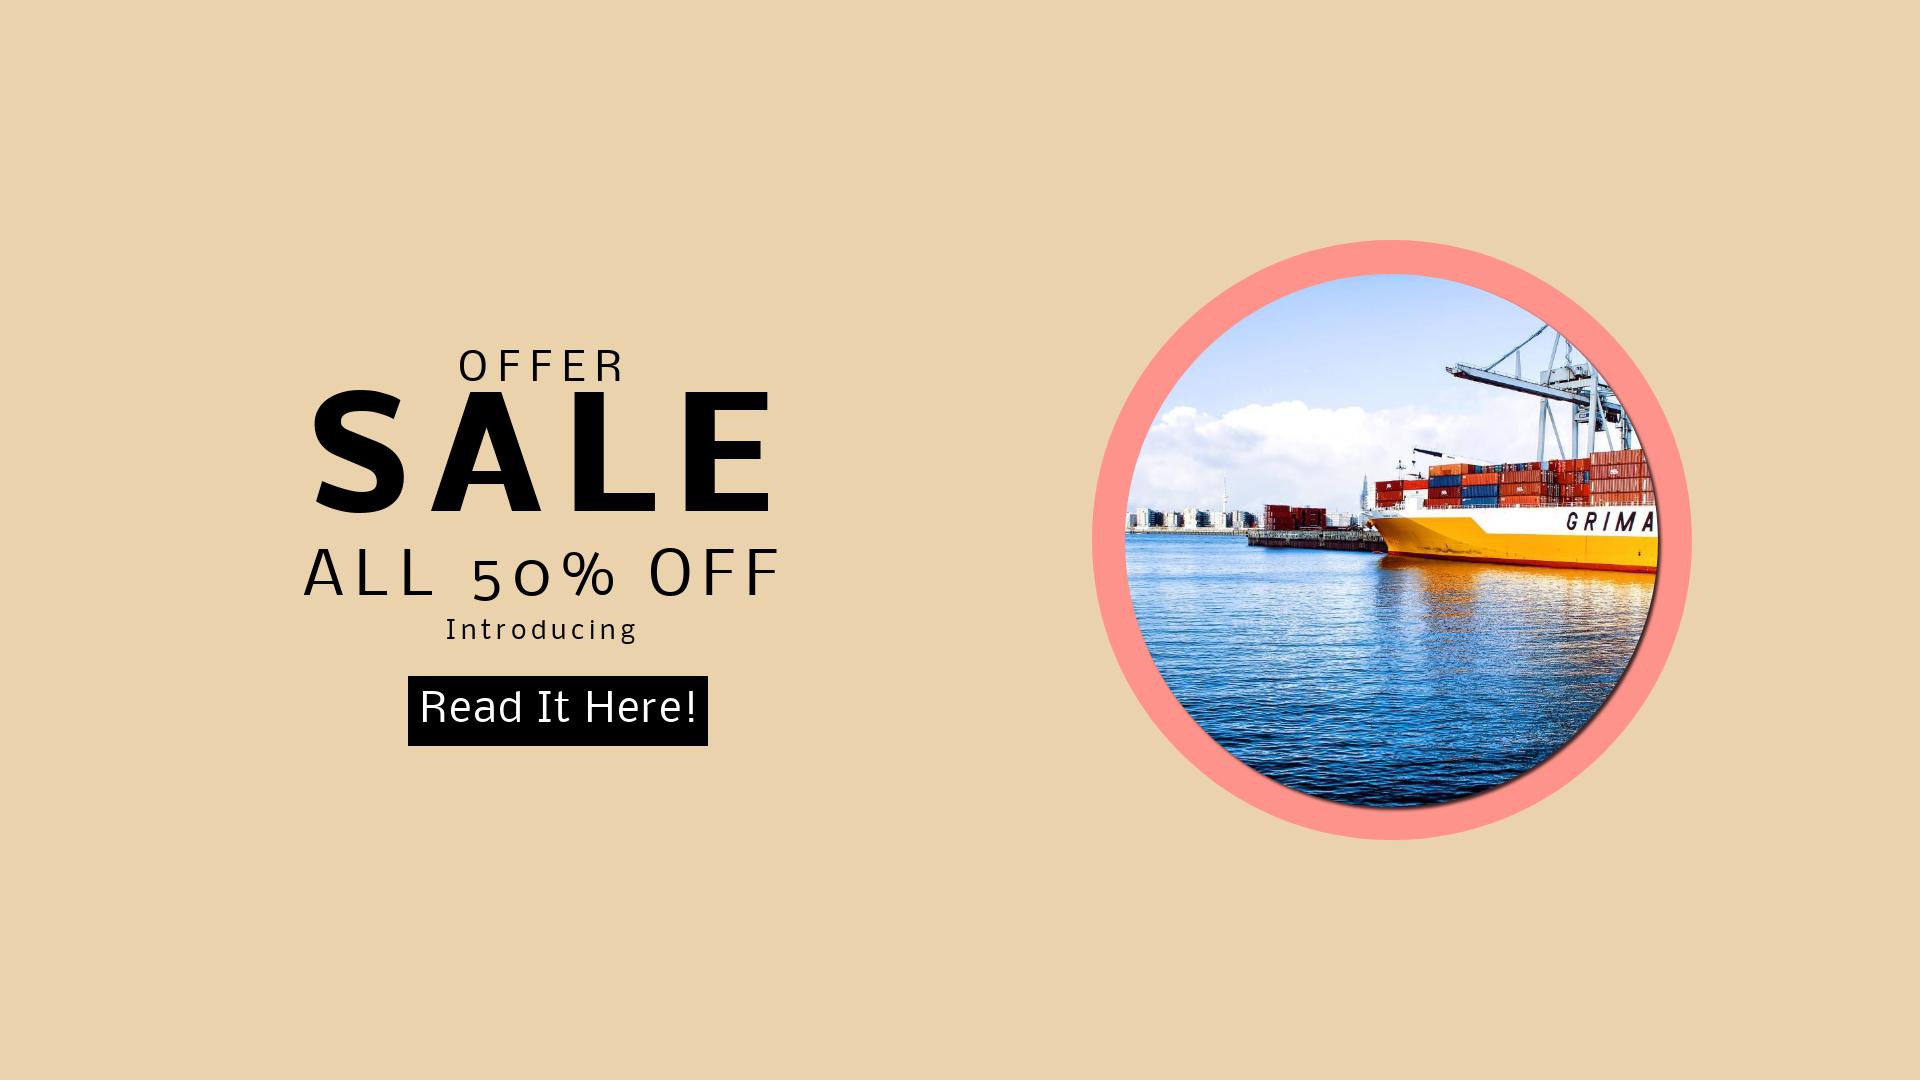 HOLIDAY,                Mode,                Motor,                Heavy,                Boat,                Load,                Industry,                Export,                Crane,                Shore,                Summer,                Tugboat,                Sailing,                 Free Image